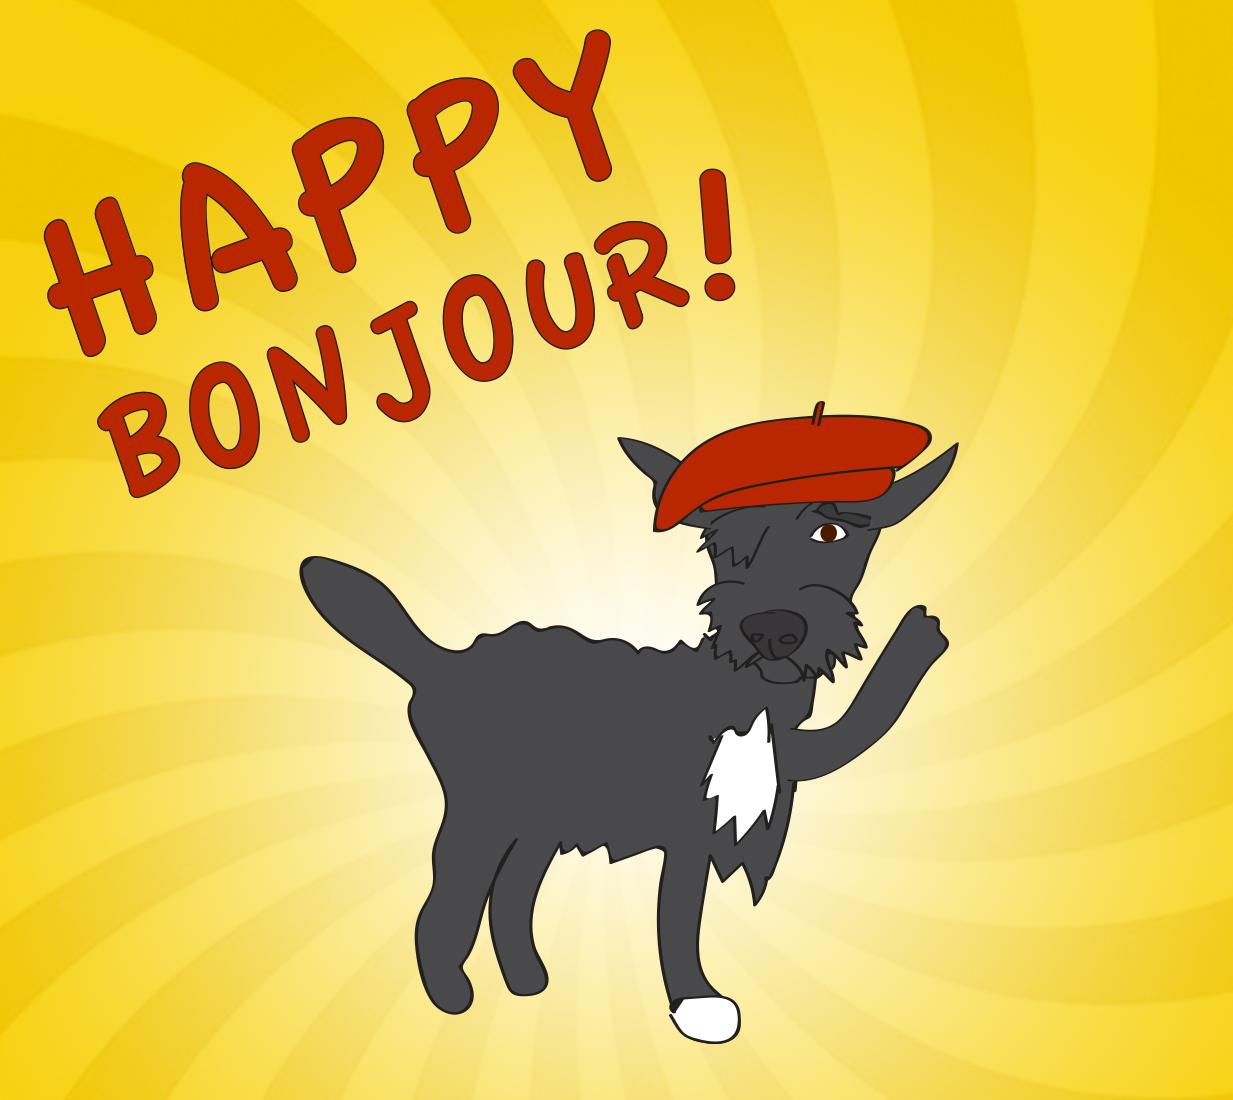 Happy Bonjour, illustration